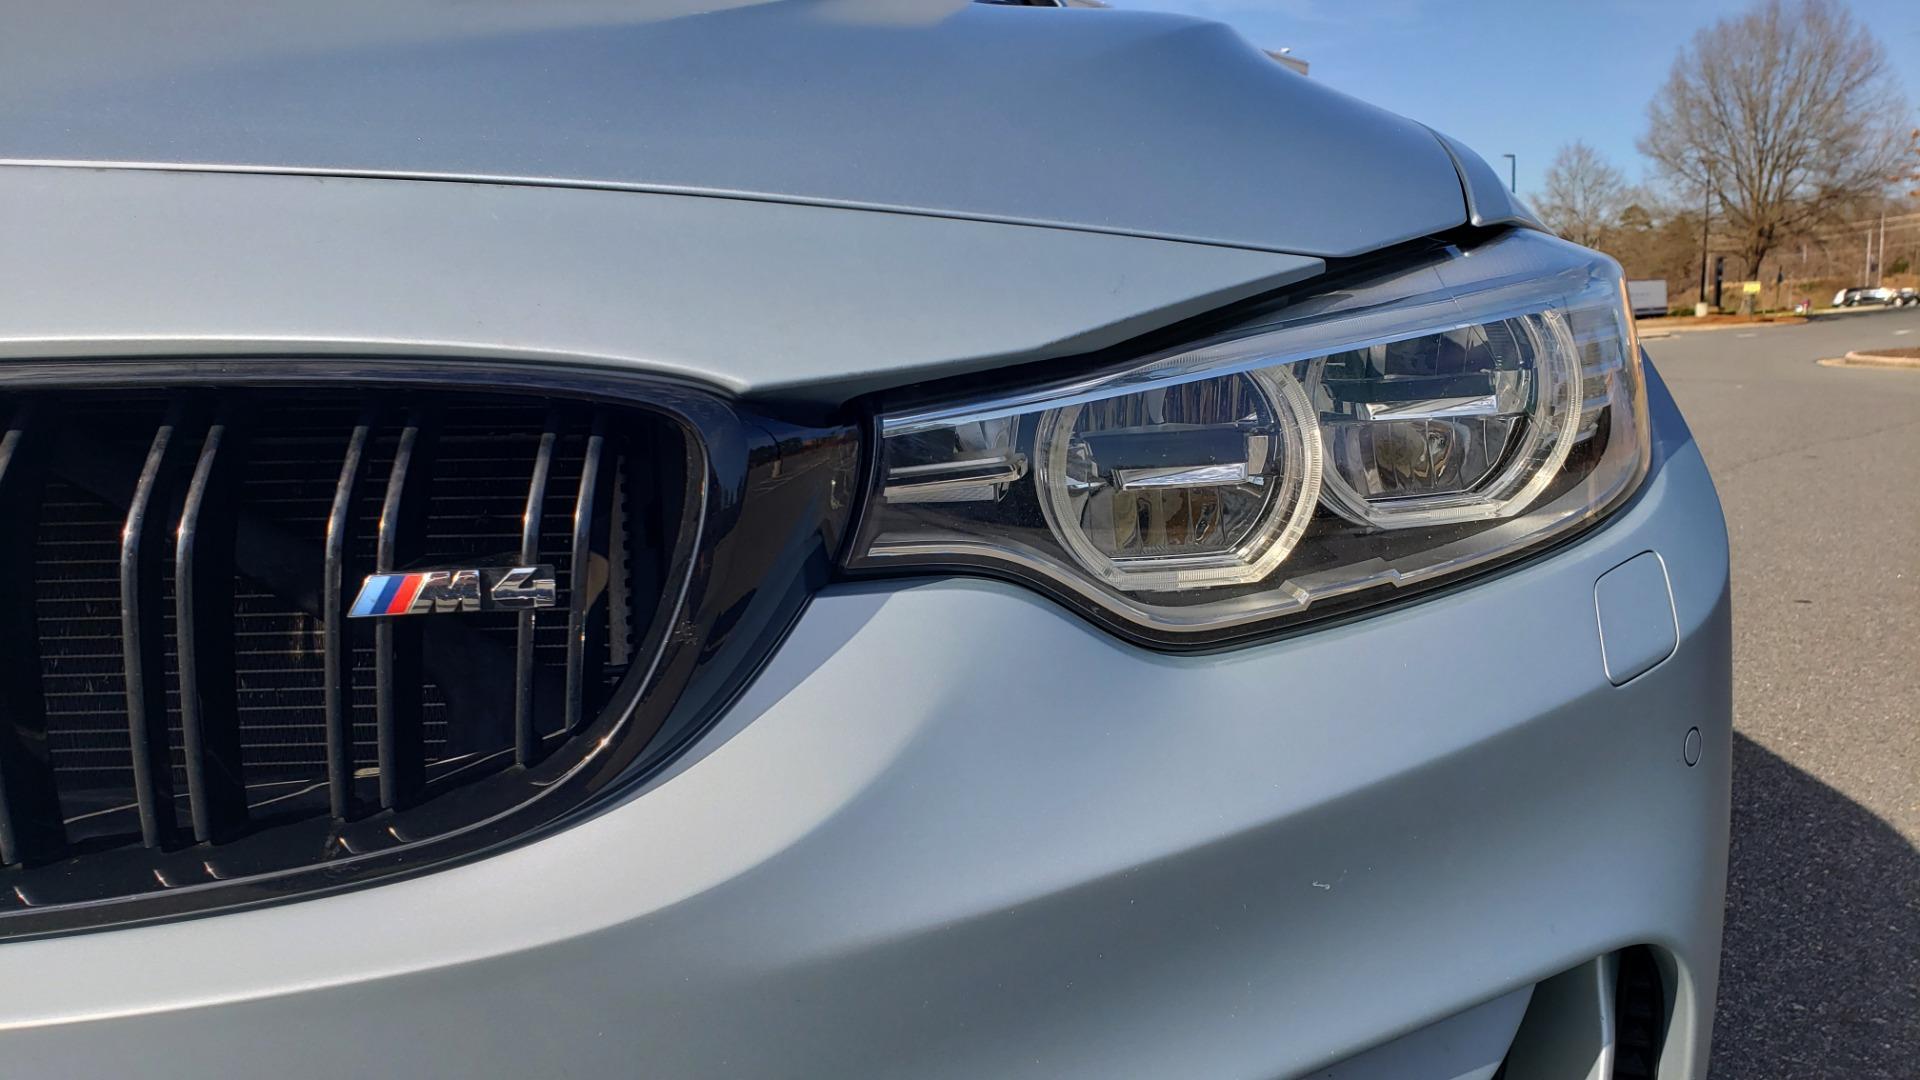 Used 2015 BMW M4 COUPE / EXEC PKG / DRVR ASST PLUS / LIGHTING / M-SUSPENSION for sale Sold at Formula Imports in Charlotte NC 28227 28